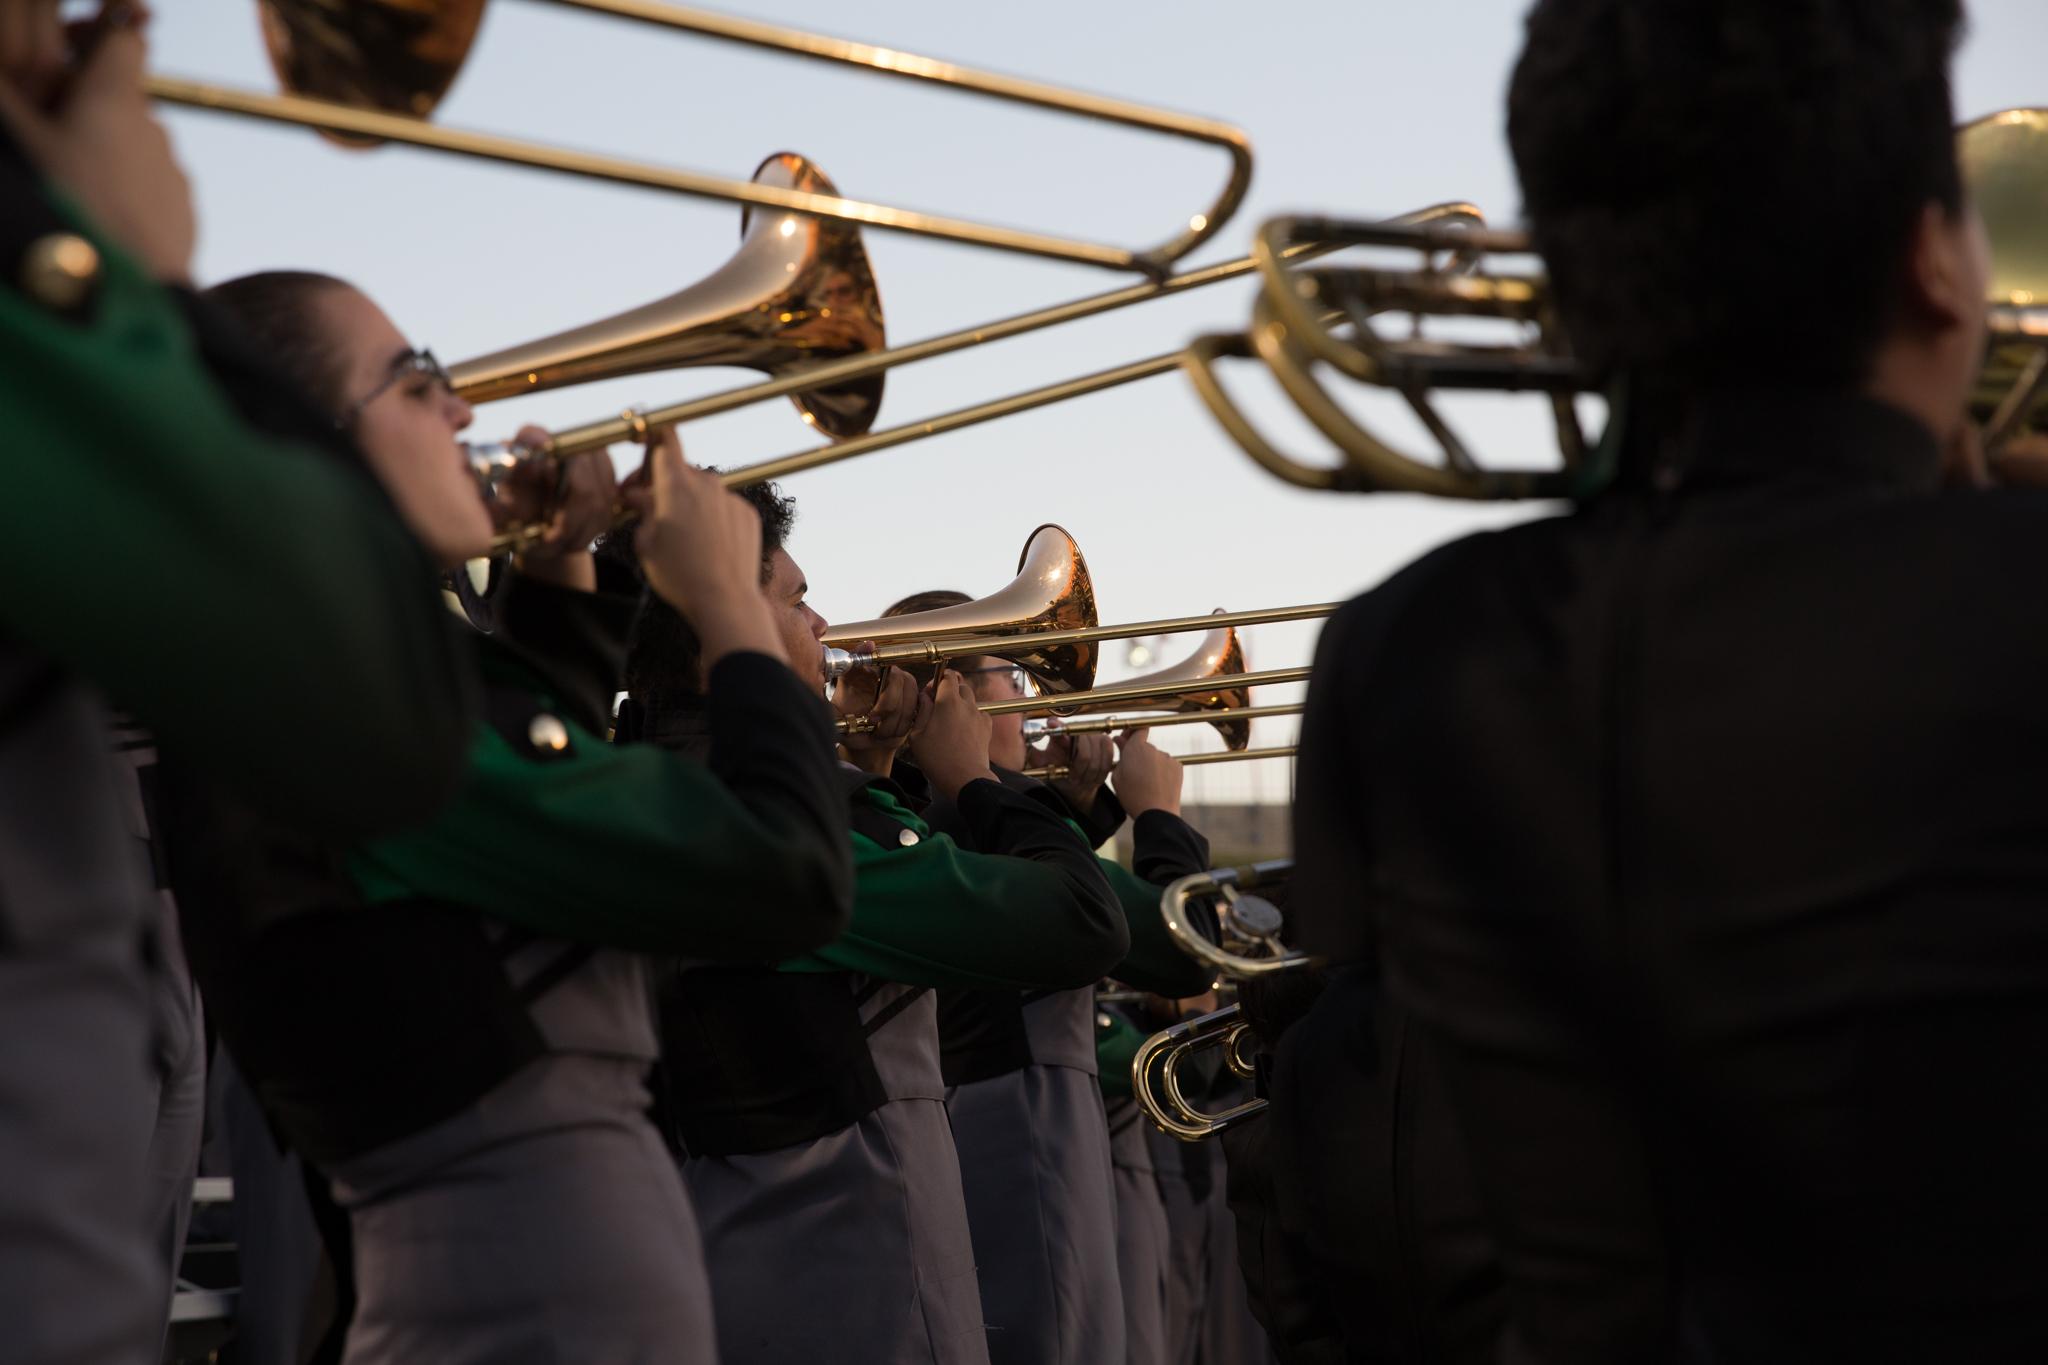 trombone players in school marching band kristina mccaleb